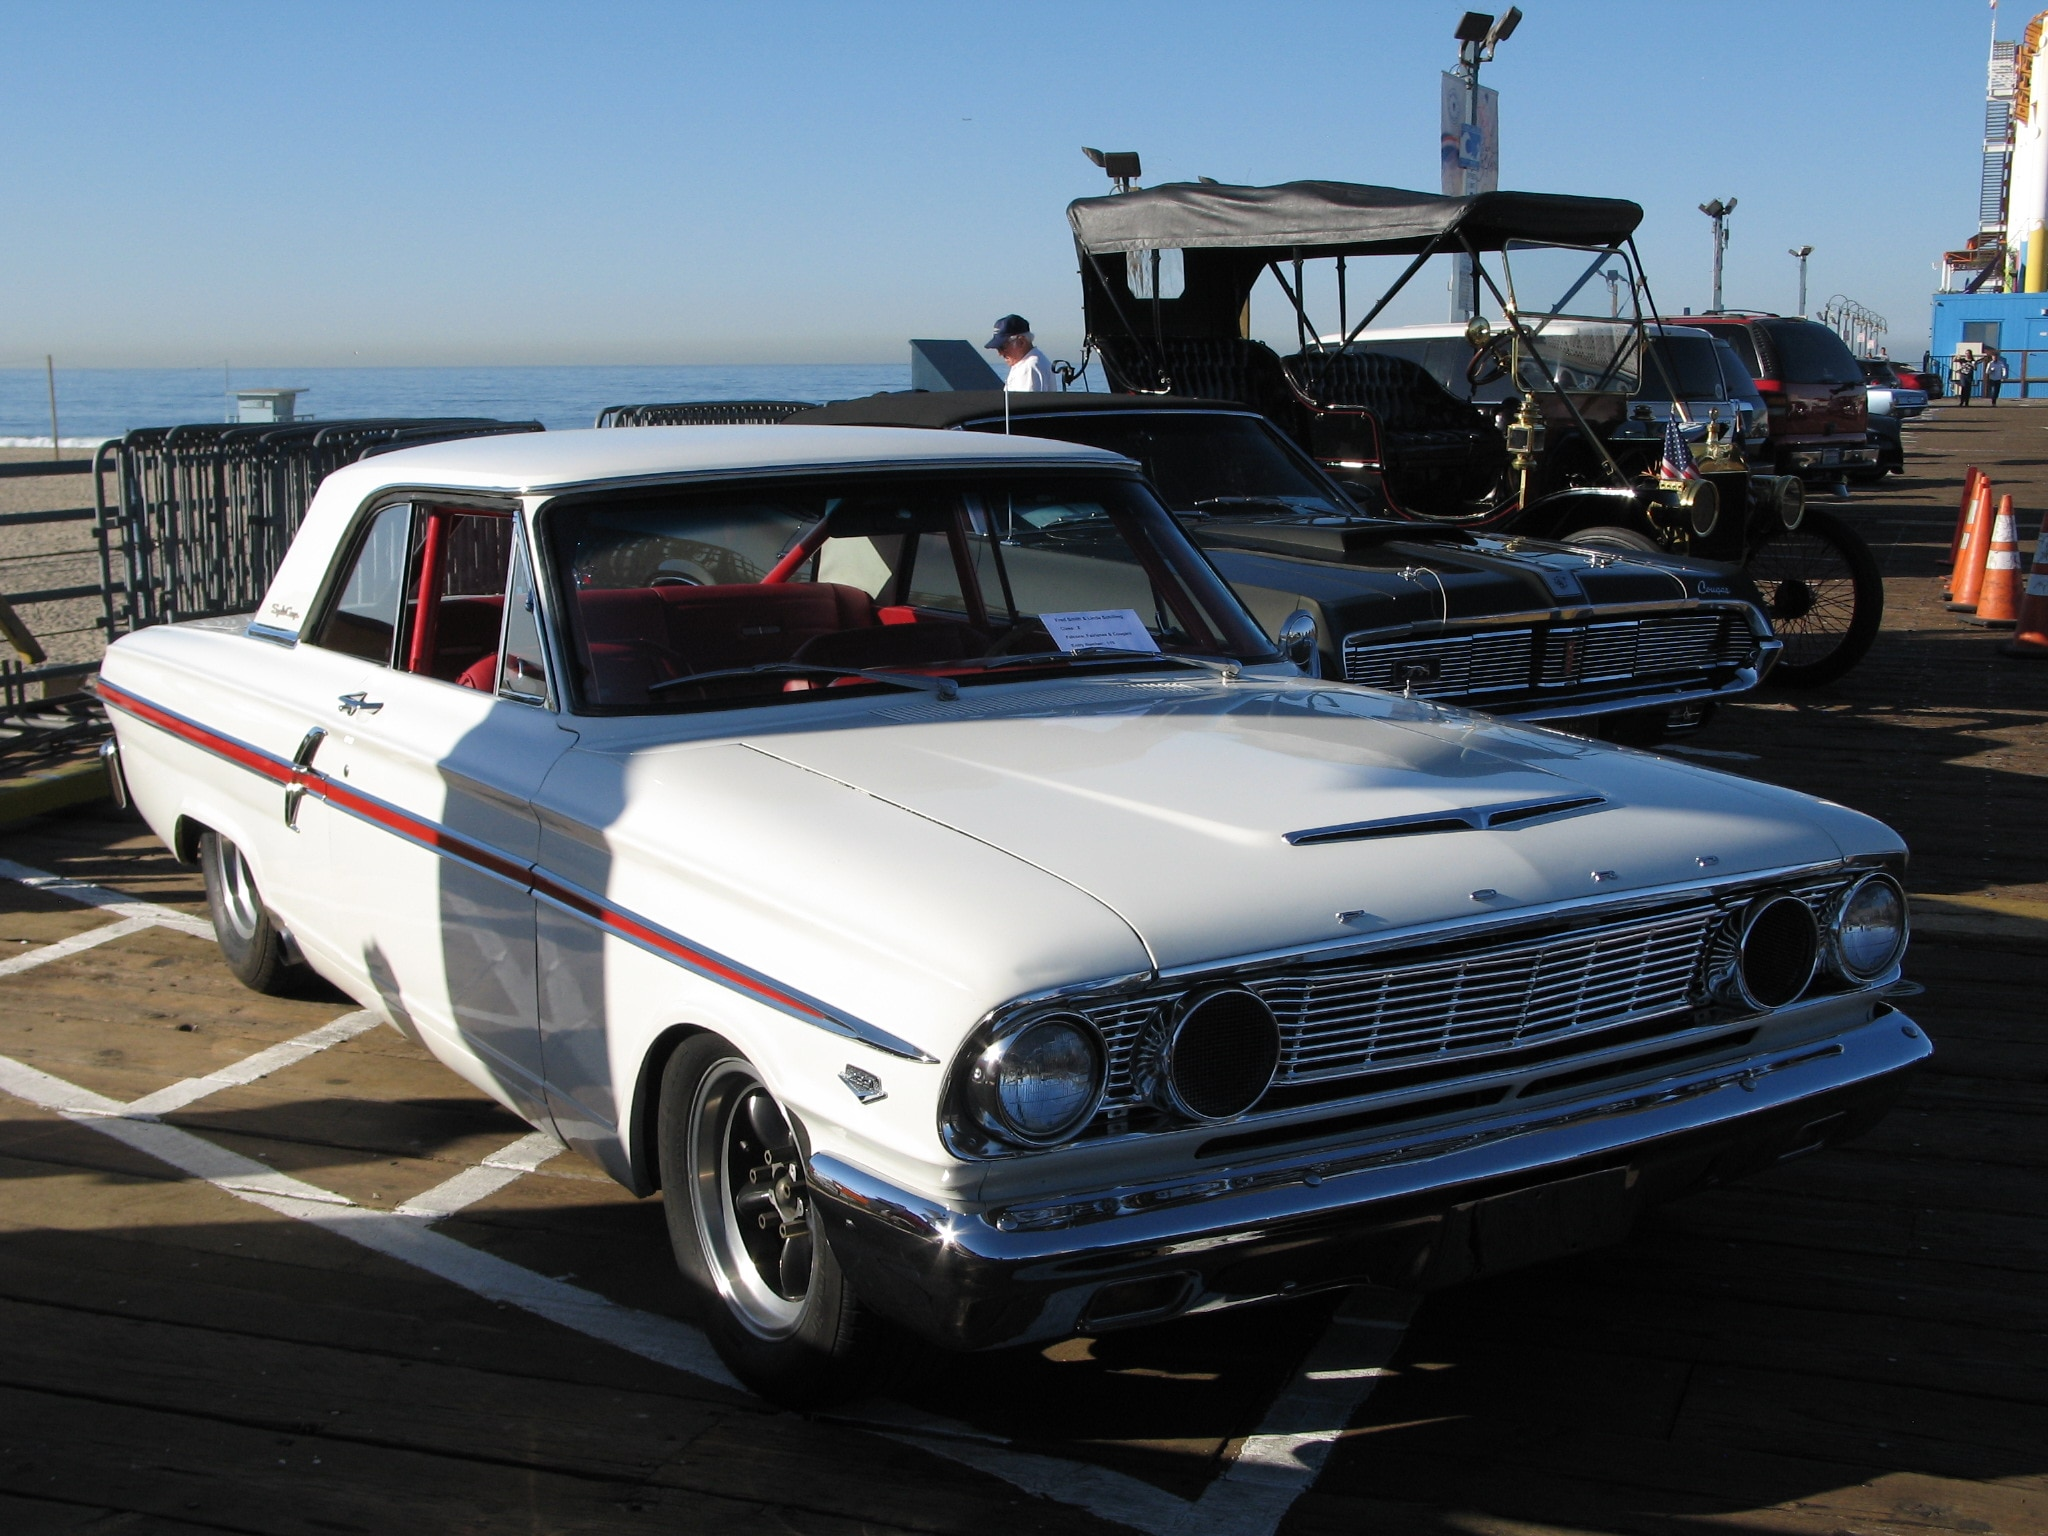 2016 Shelbys On Santa Monica Pier Lasaac 21